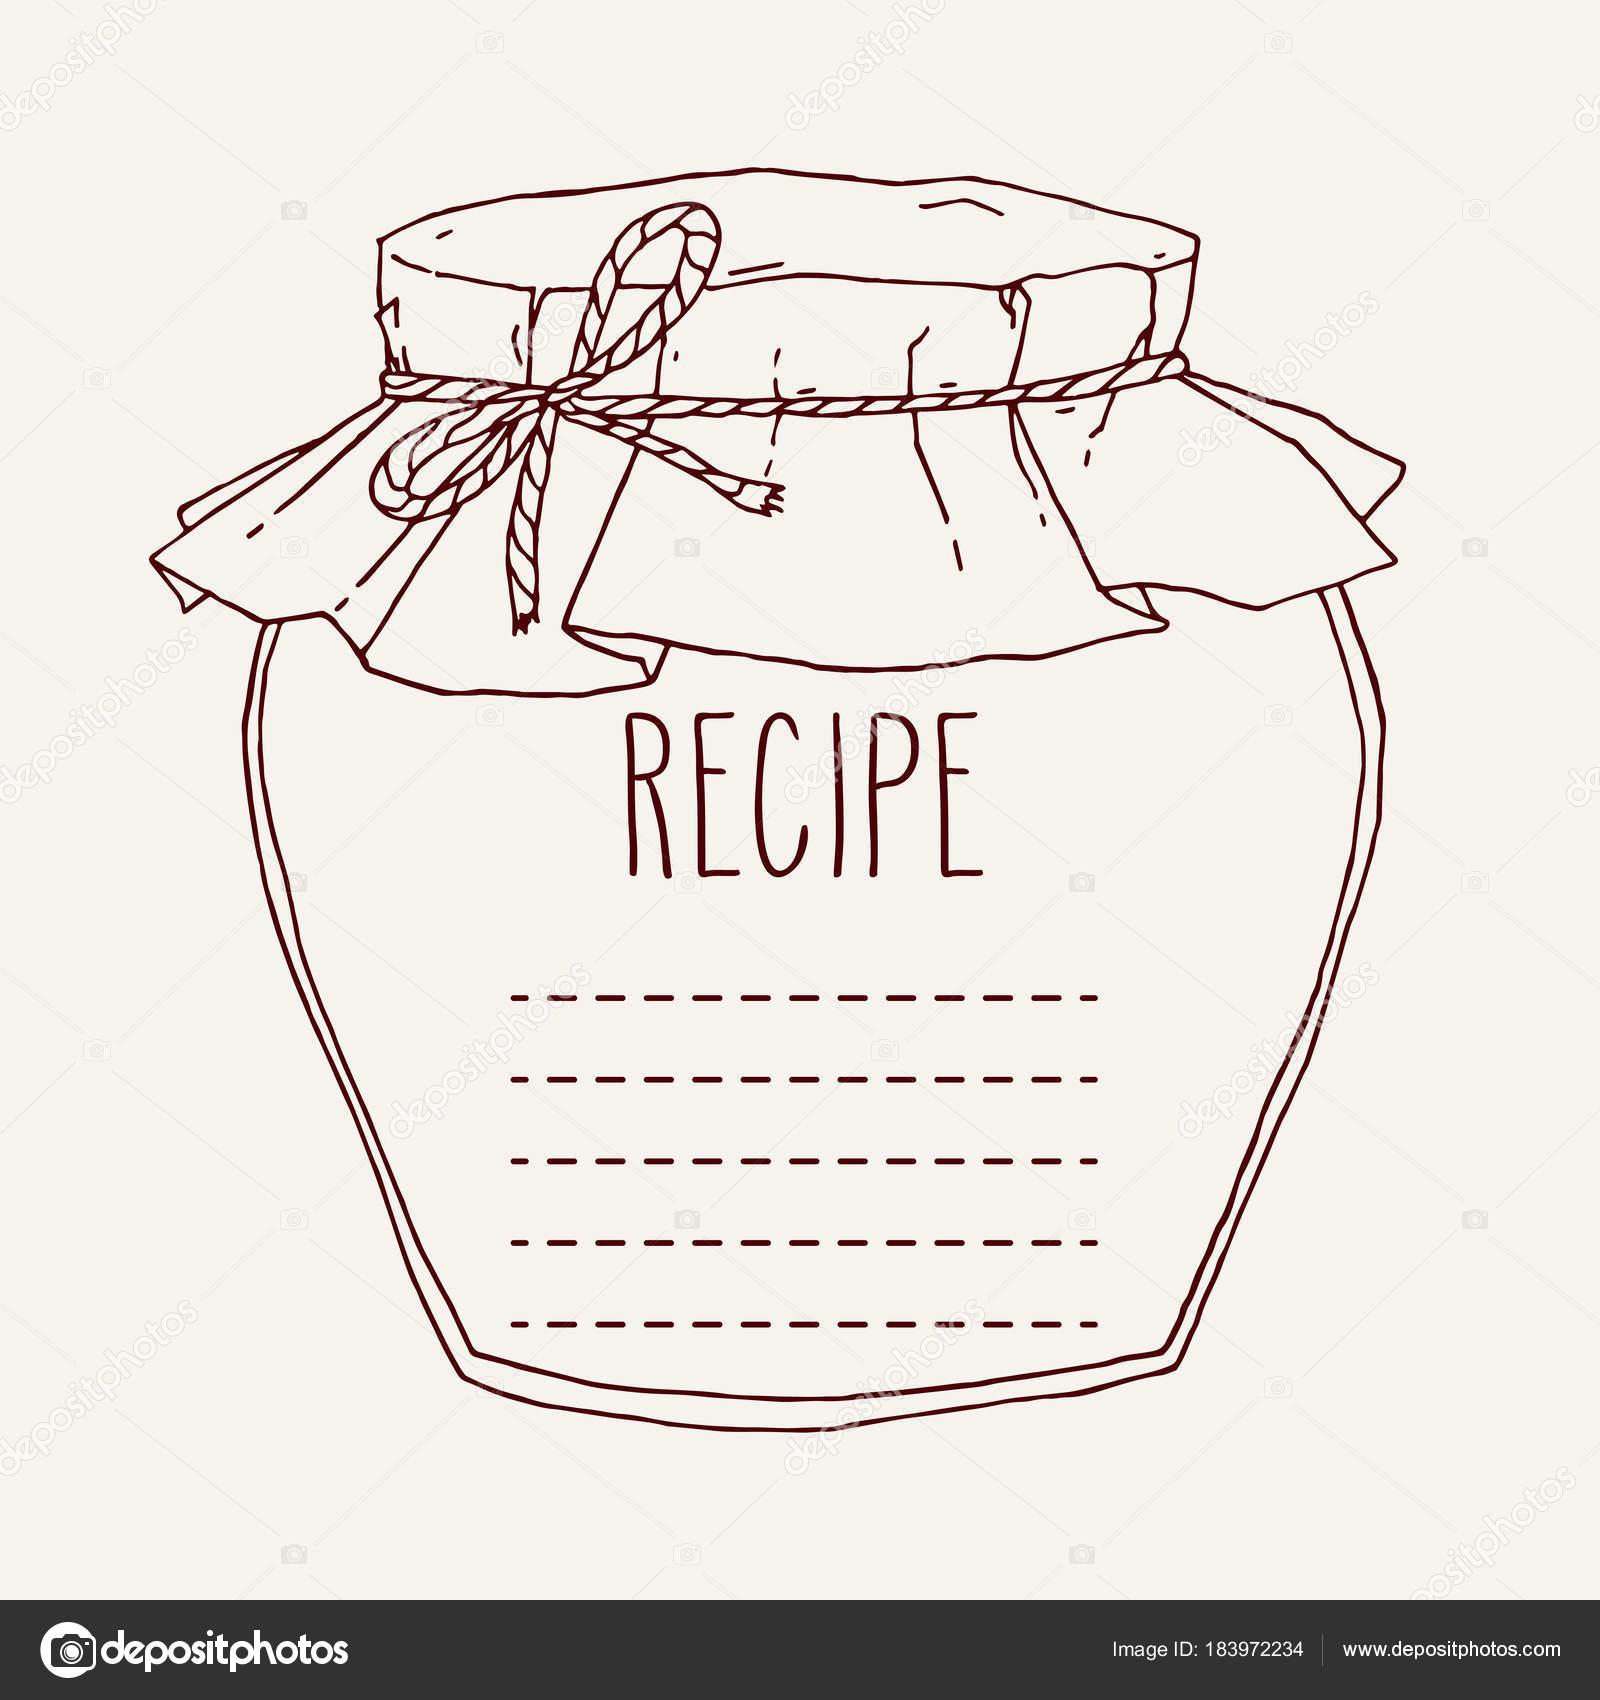 Mano dibuja la plantilla de receta de tarro de mermelada — Vector ...